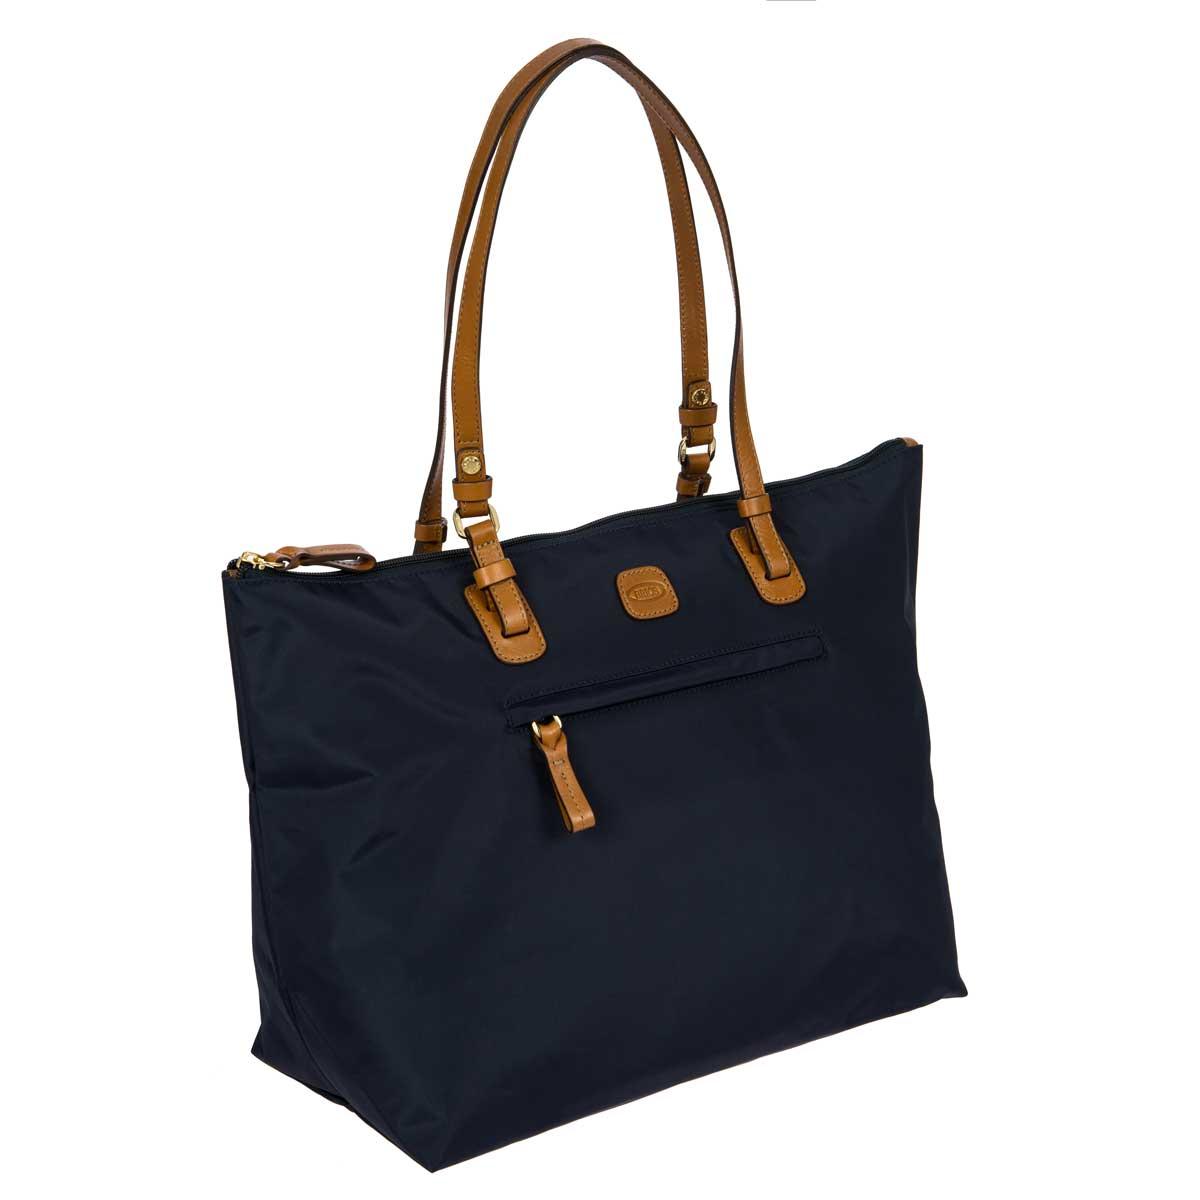 60367492b7b X-Bag Large Sportina 3-Way Shopper Tote Bag - Blue